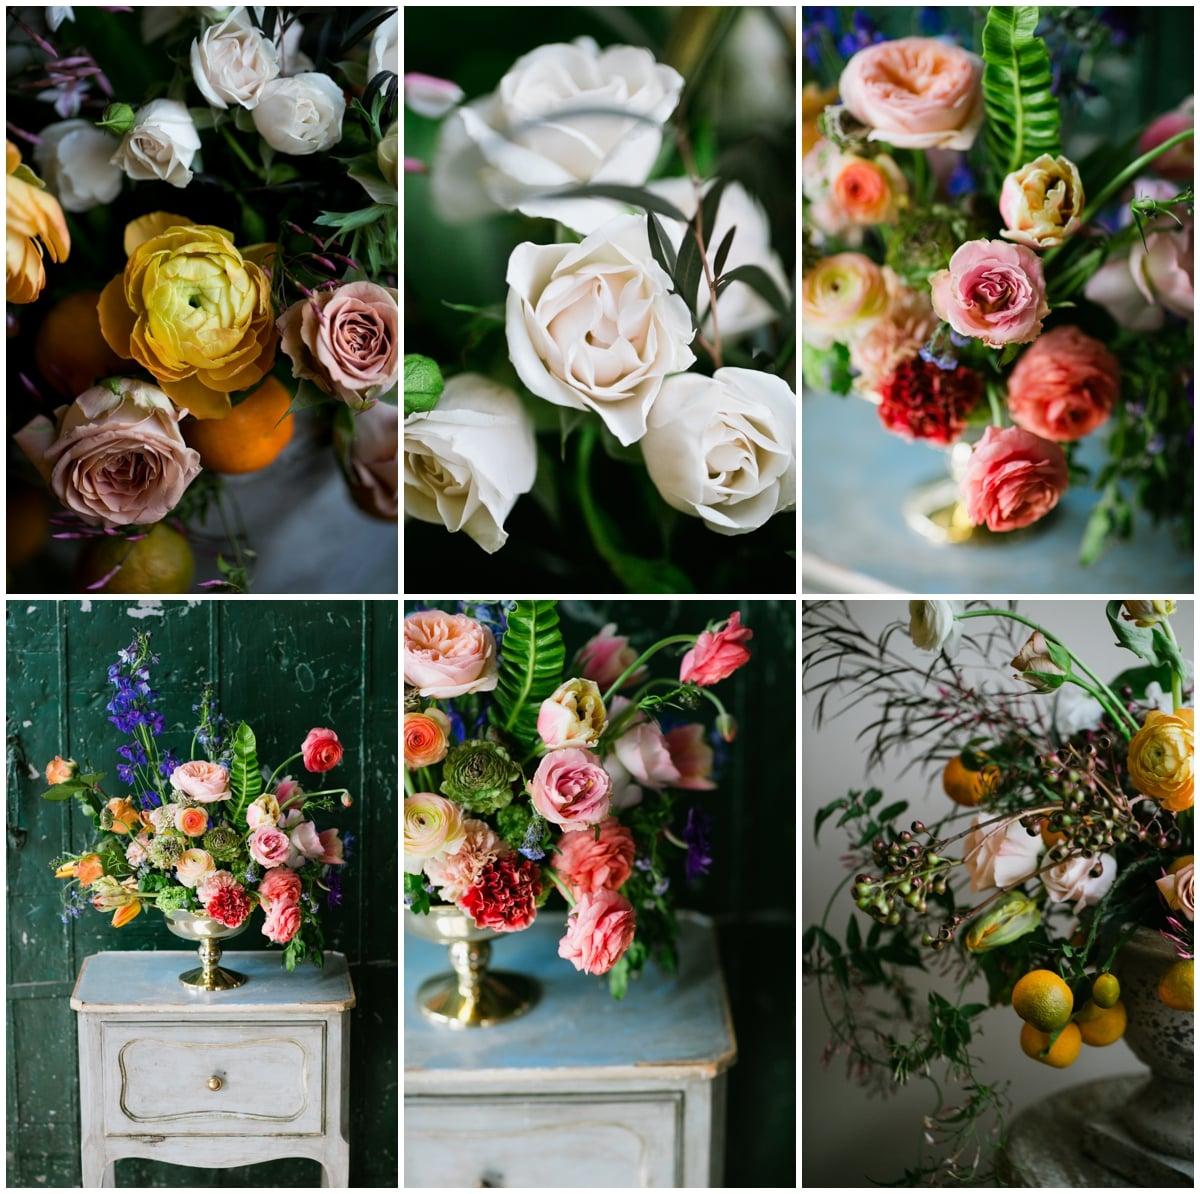 Flower Photographer, Still Life, Flower Photography, Wedding Floral Inspiration